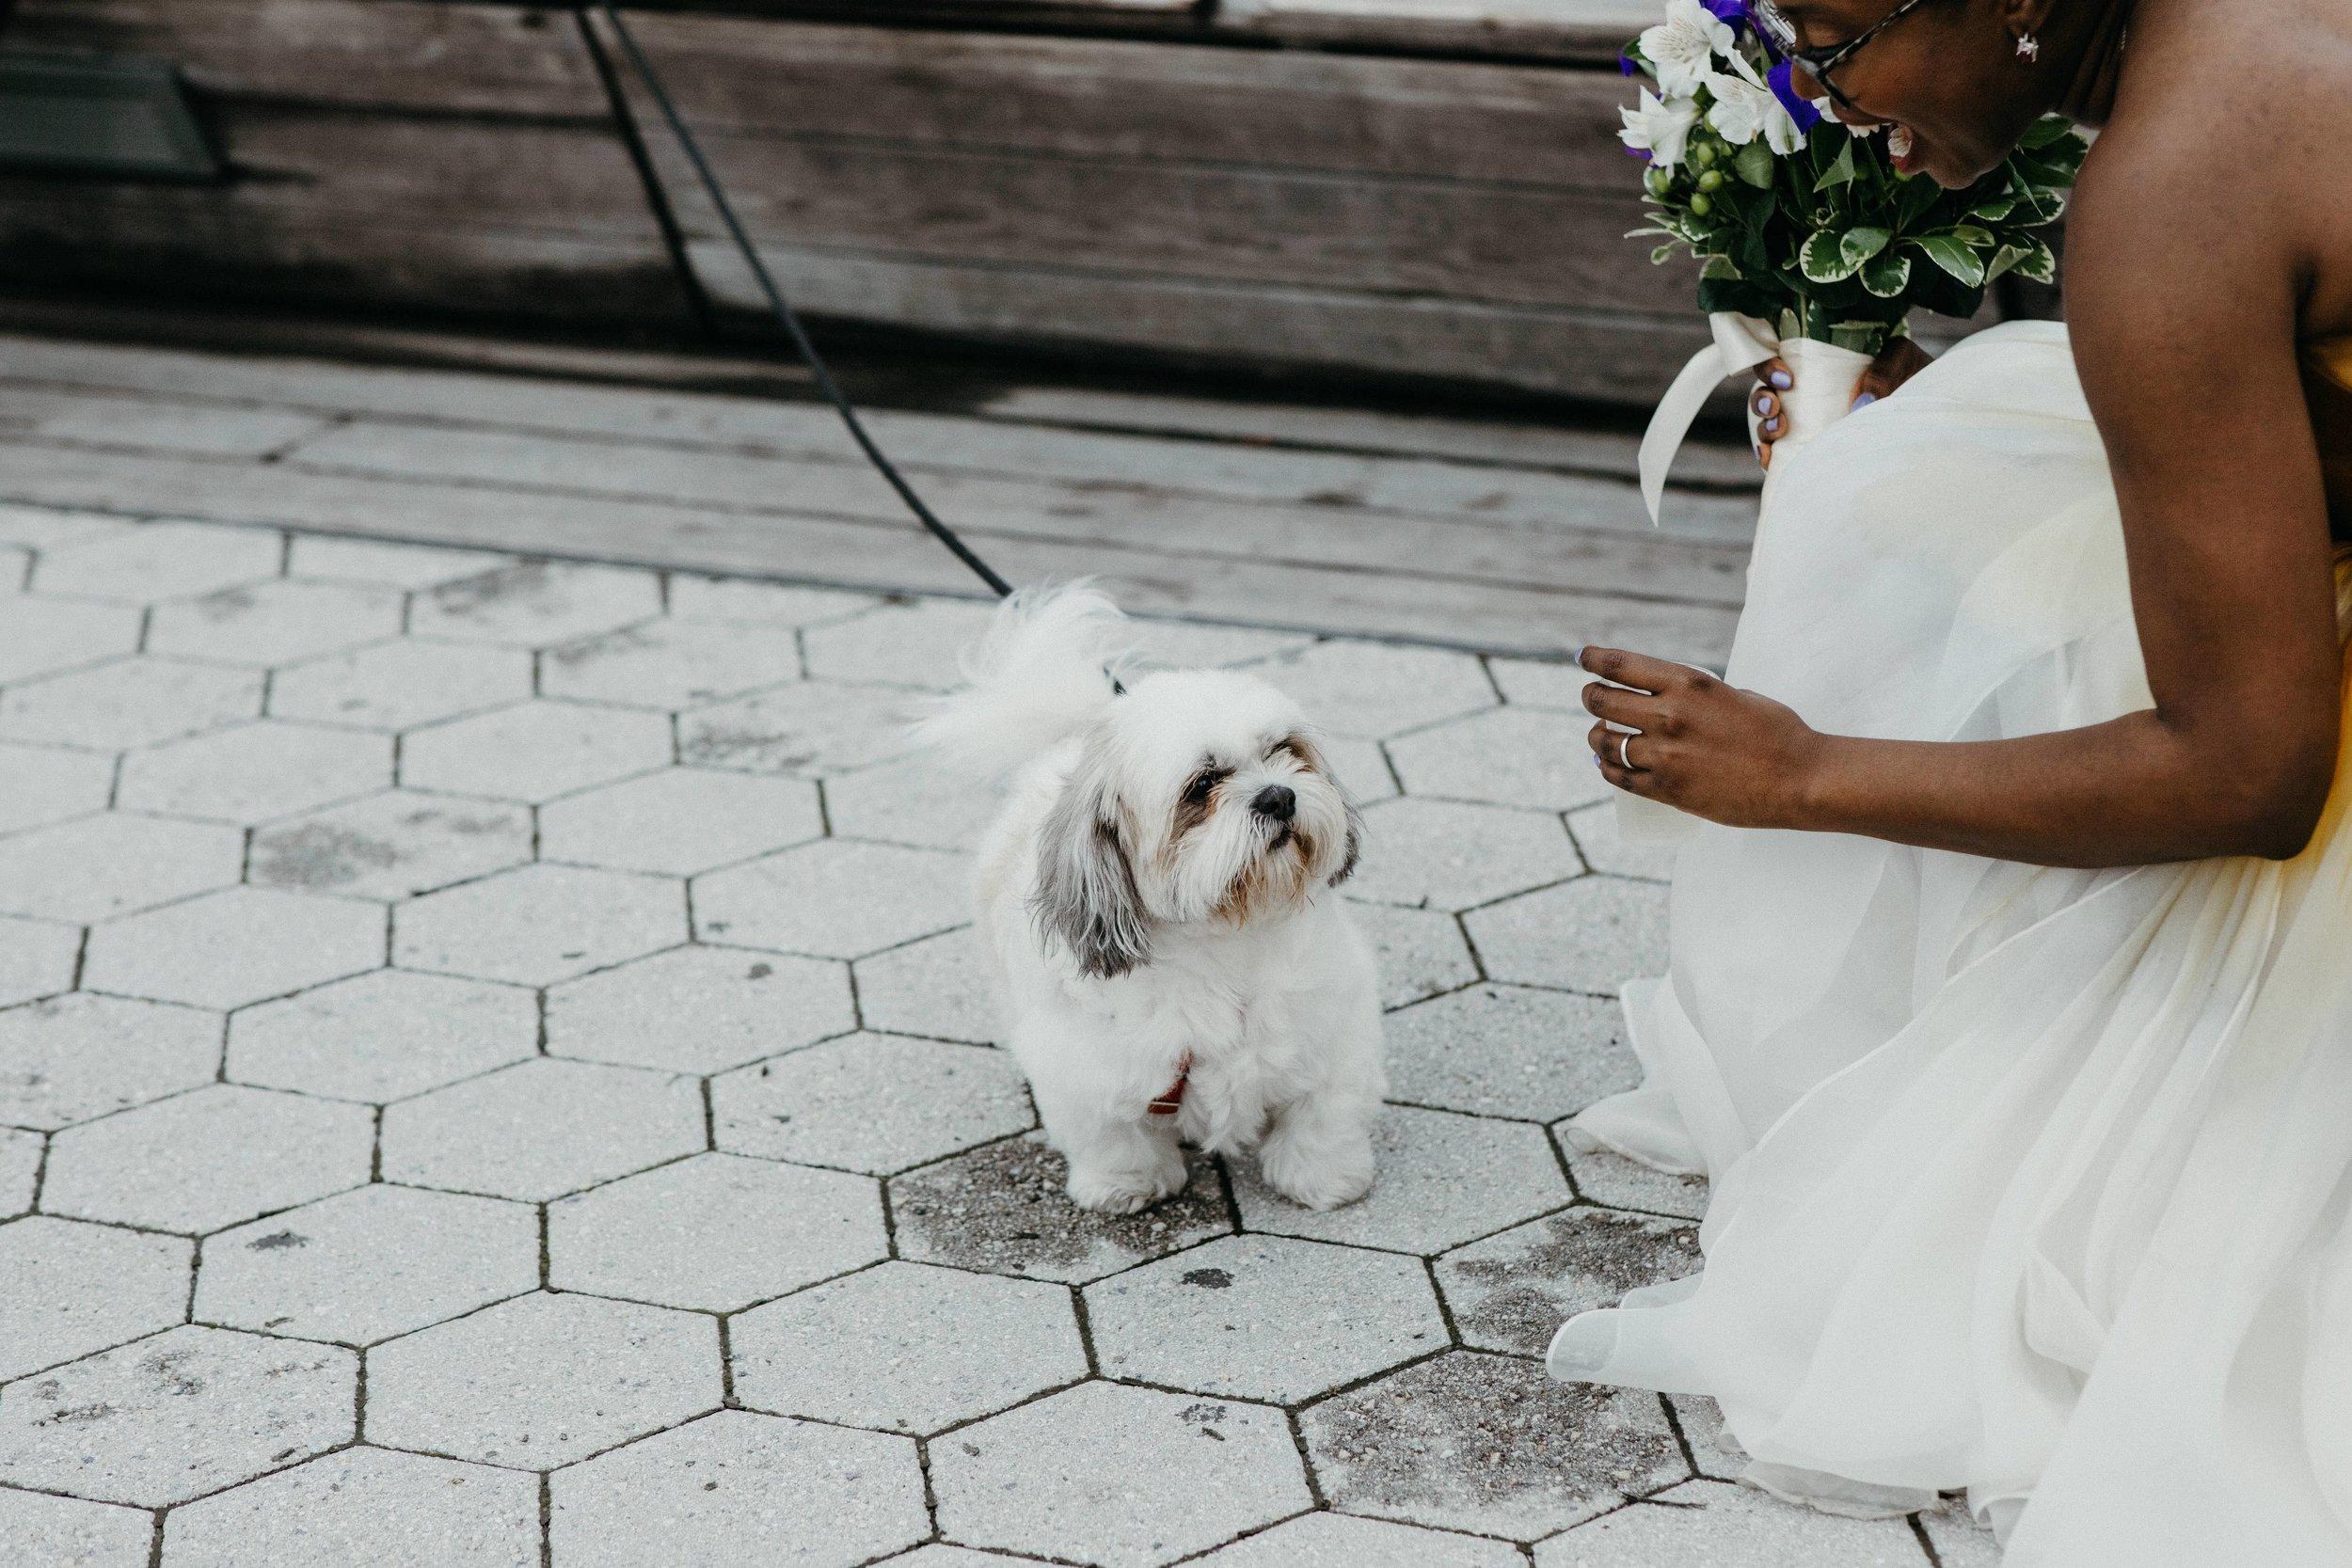 Sevlynn-Photography-Wedding-LIC-Landing-Maiella-NYC-50.jpg